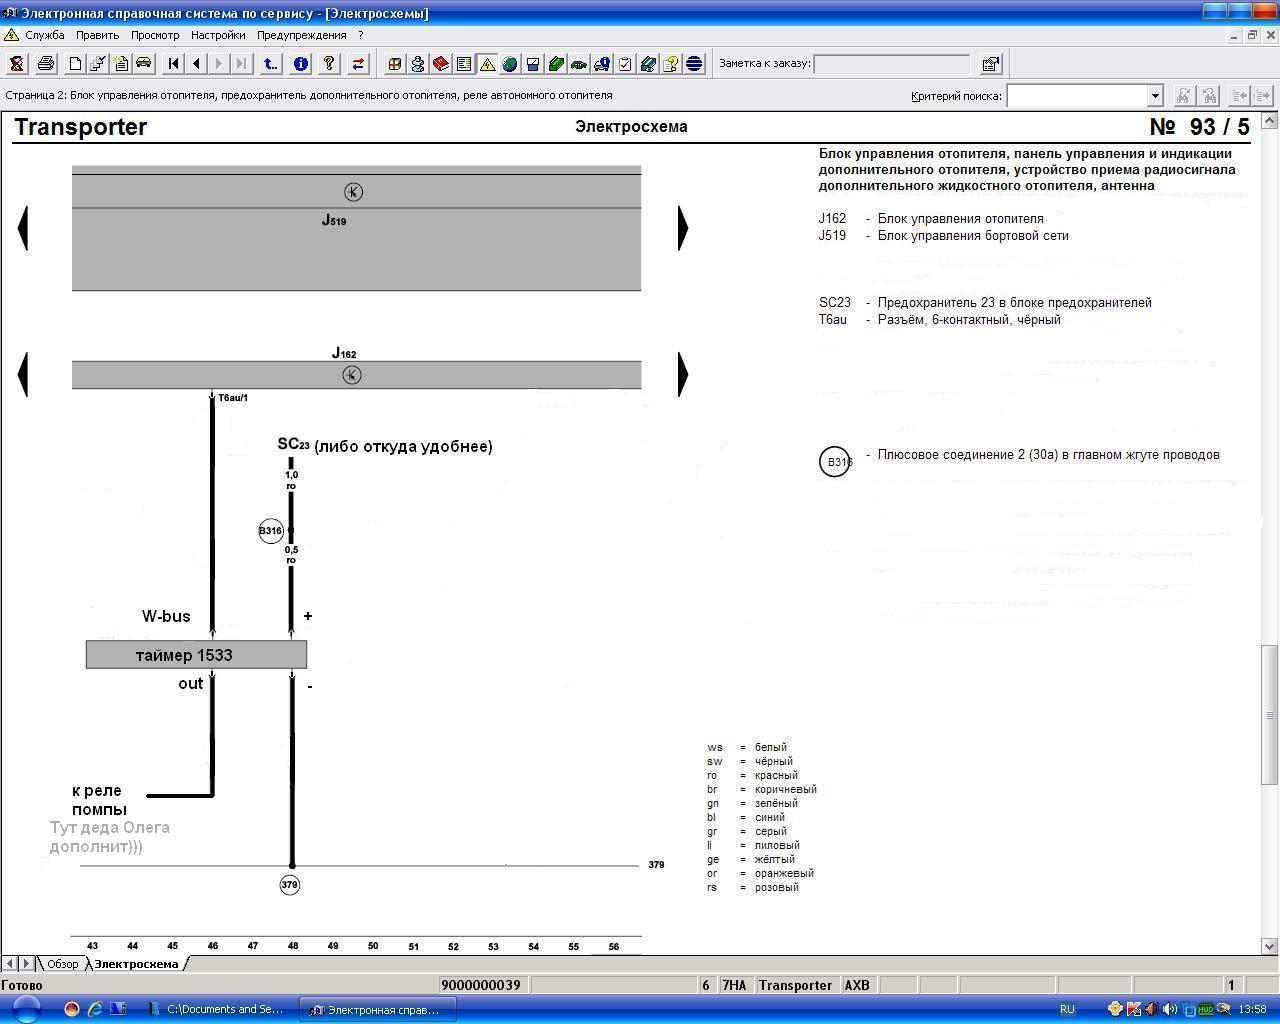 Схема webasto минитаймер 1533